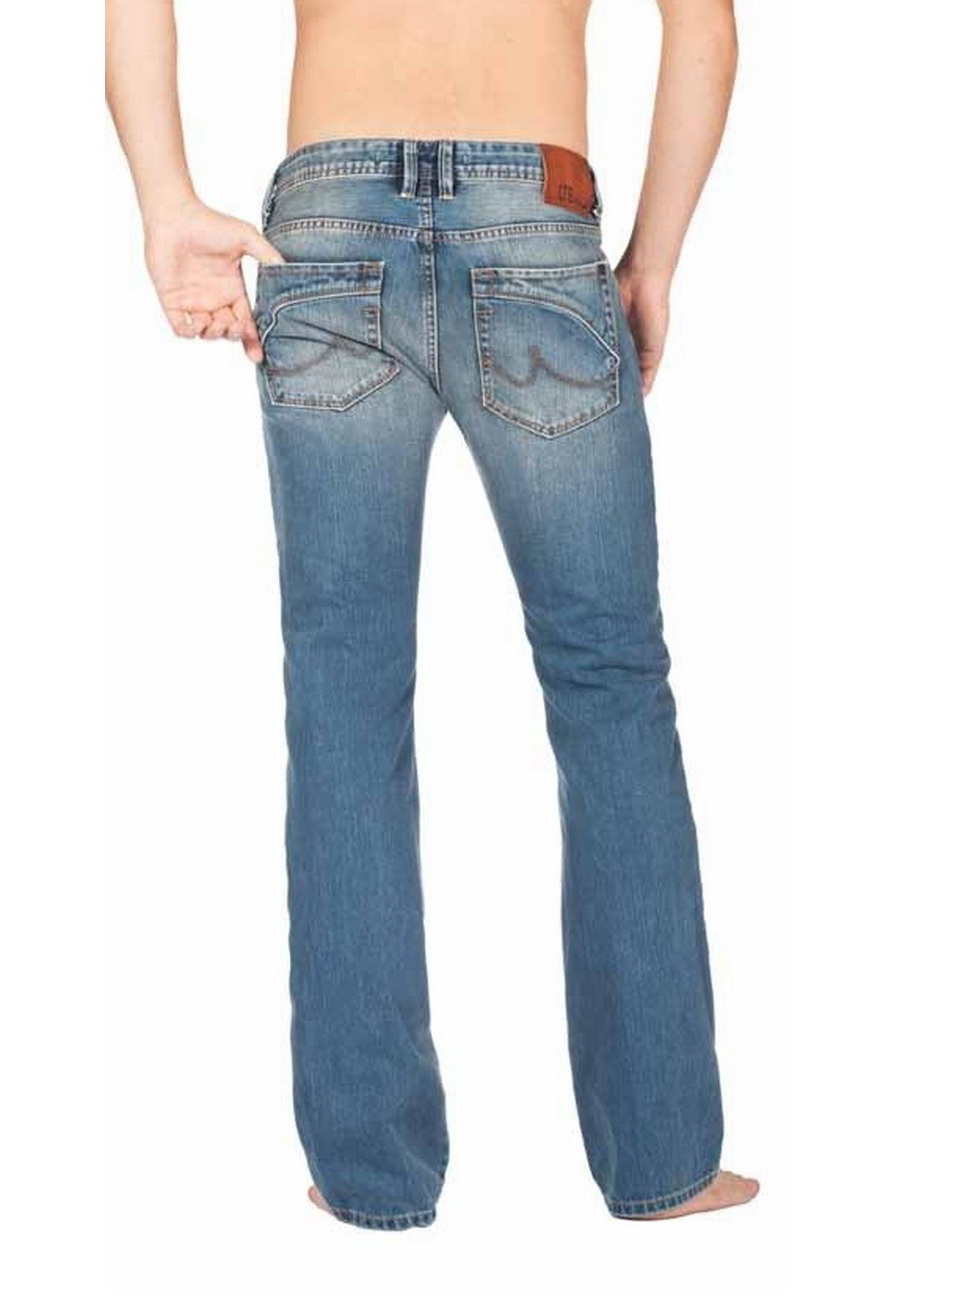 ltb herren jeans roden bootcut powder aged kaufen jeans direct de. Black Bedroom Furniture Sets. Home Design Ideas